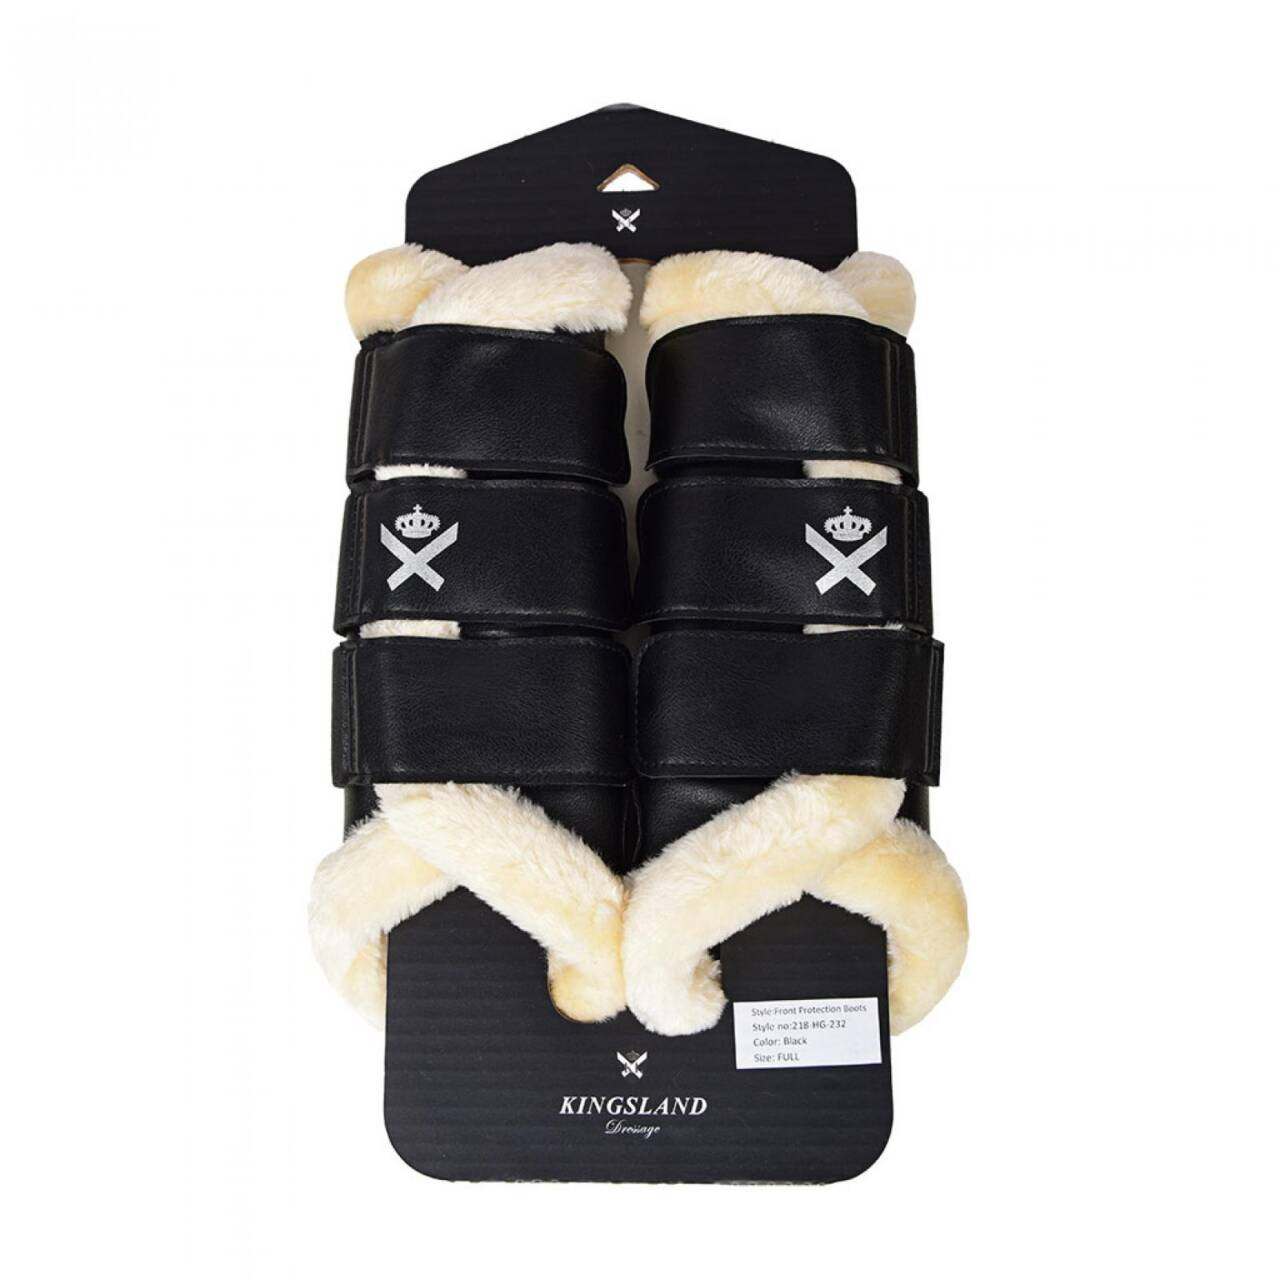 Kingsland Tali procetion boots sort